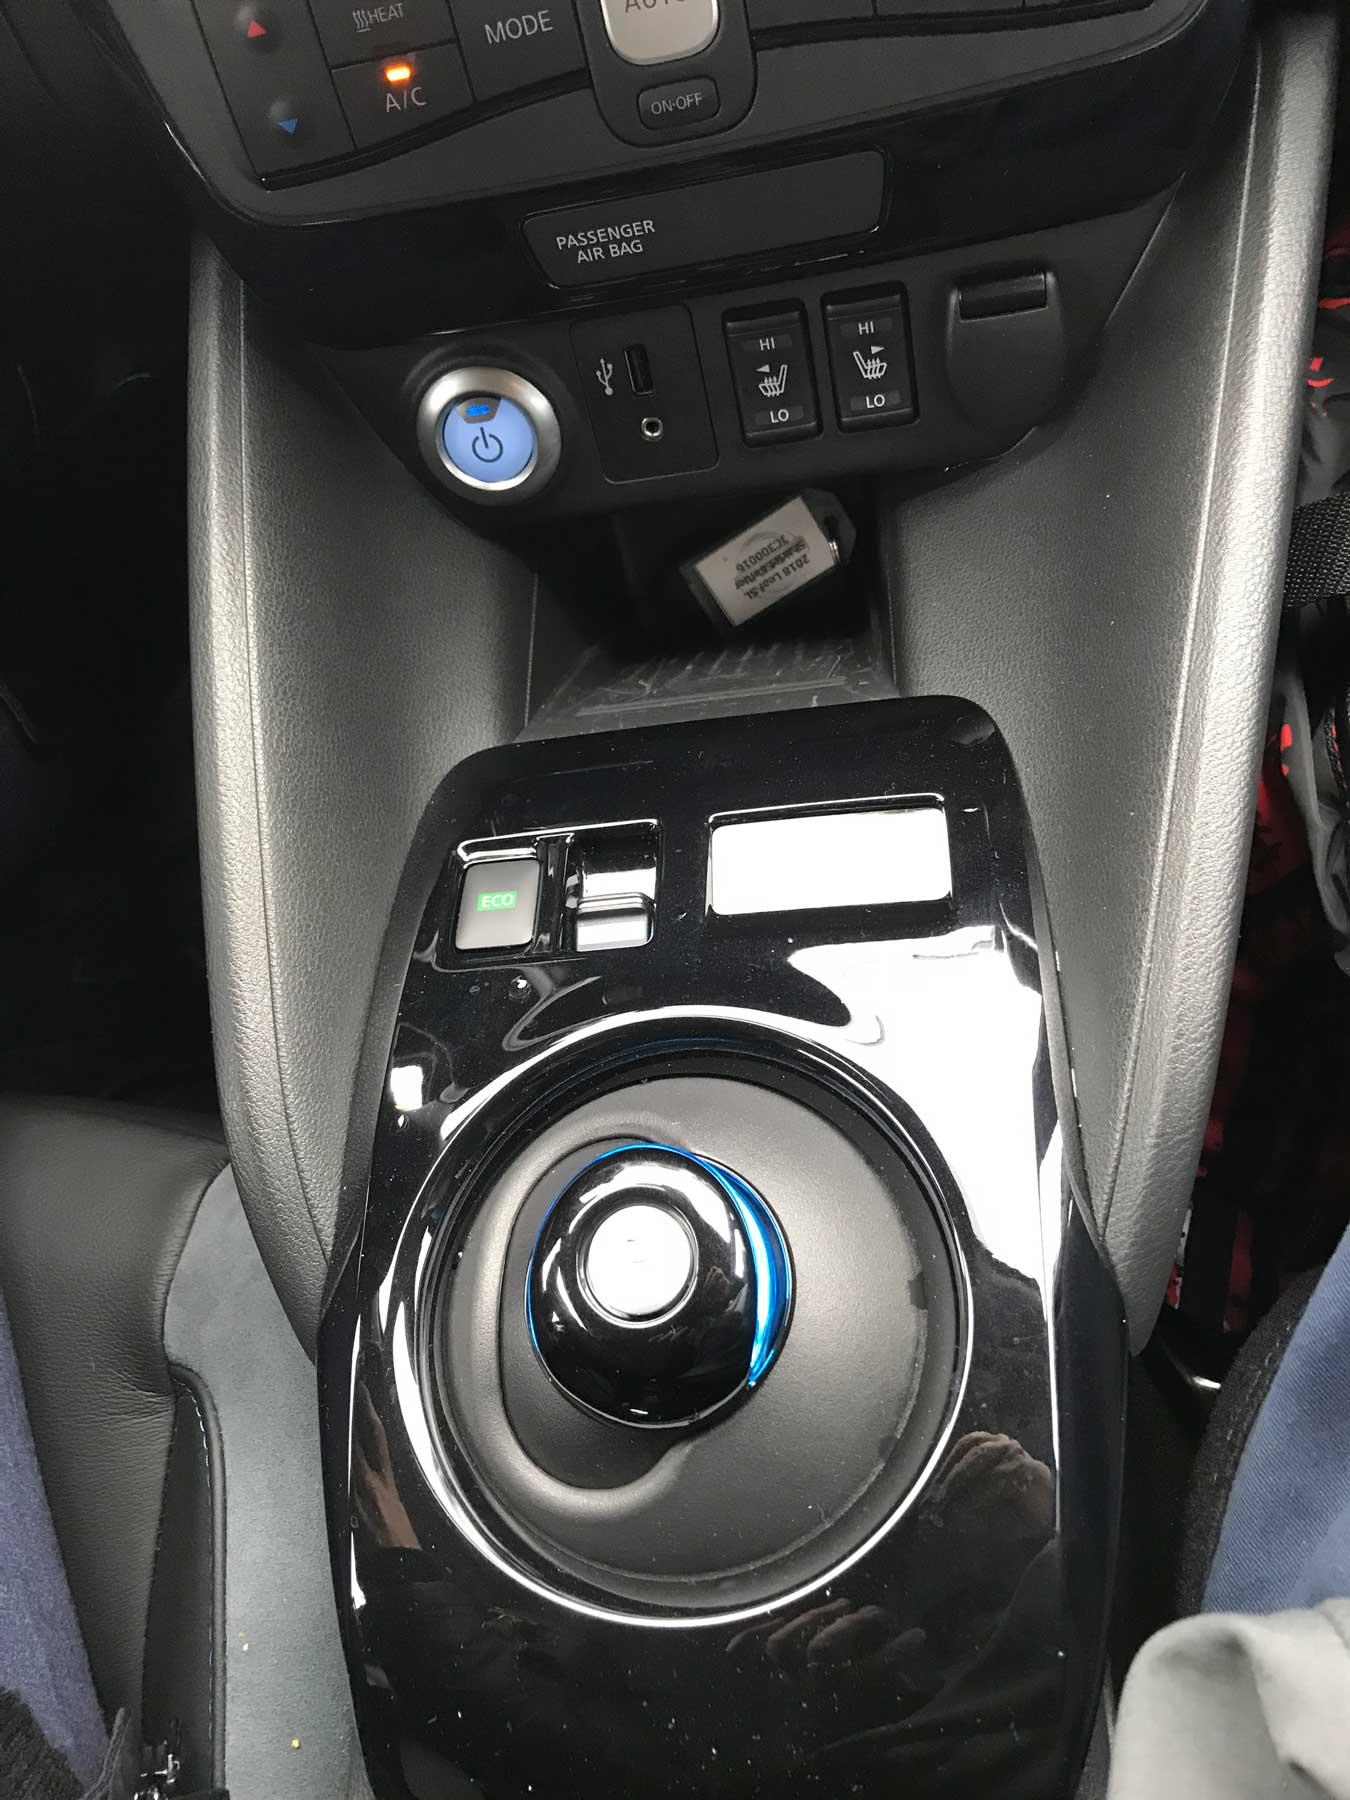 Nissan Leaf controls